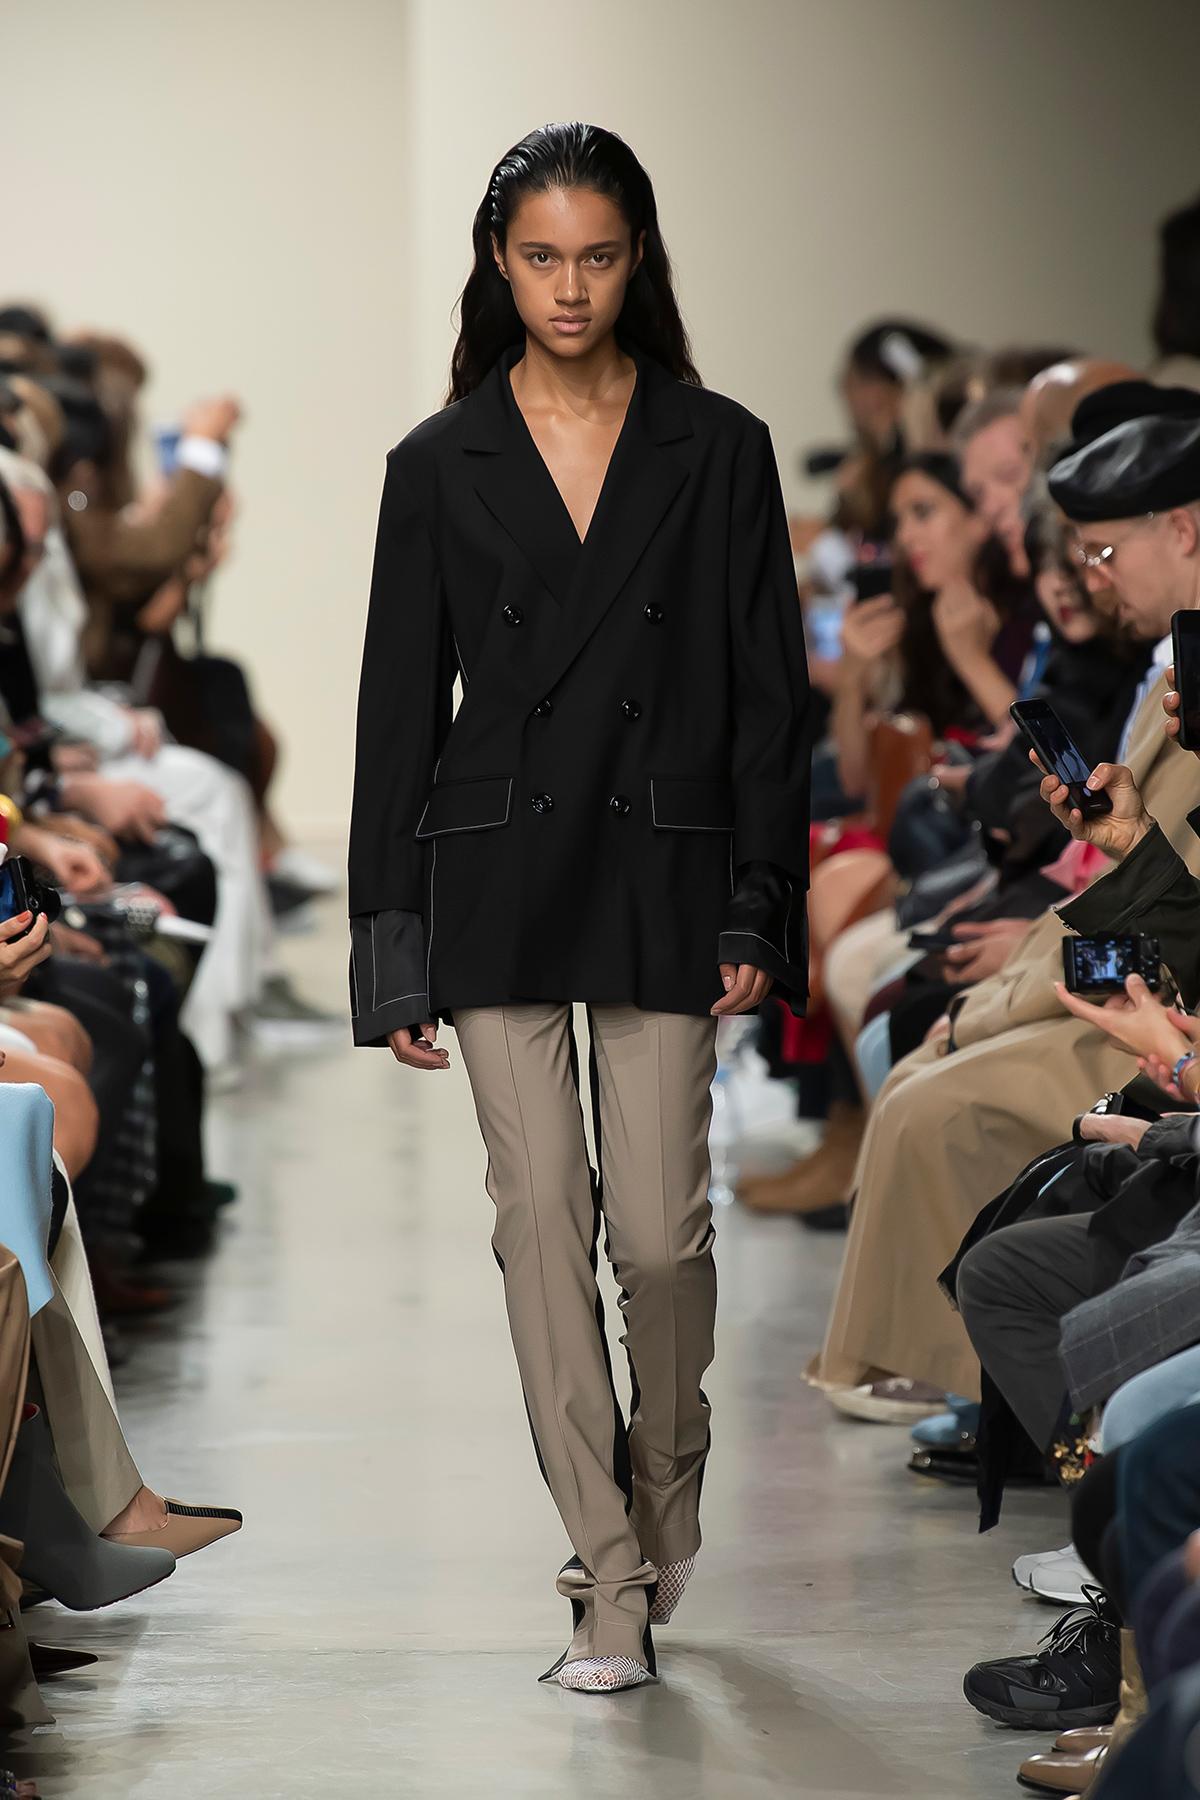 LOOK 8 Blazer PARILYSE Trousers PRIVELA